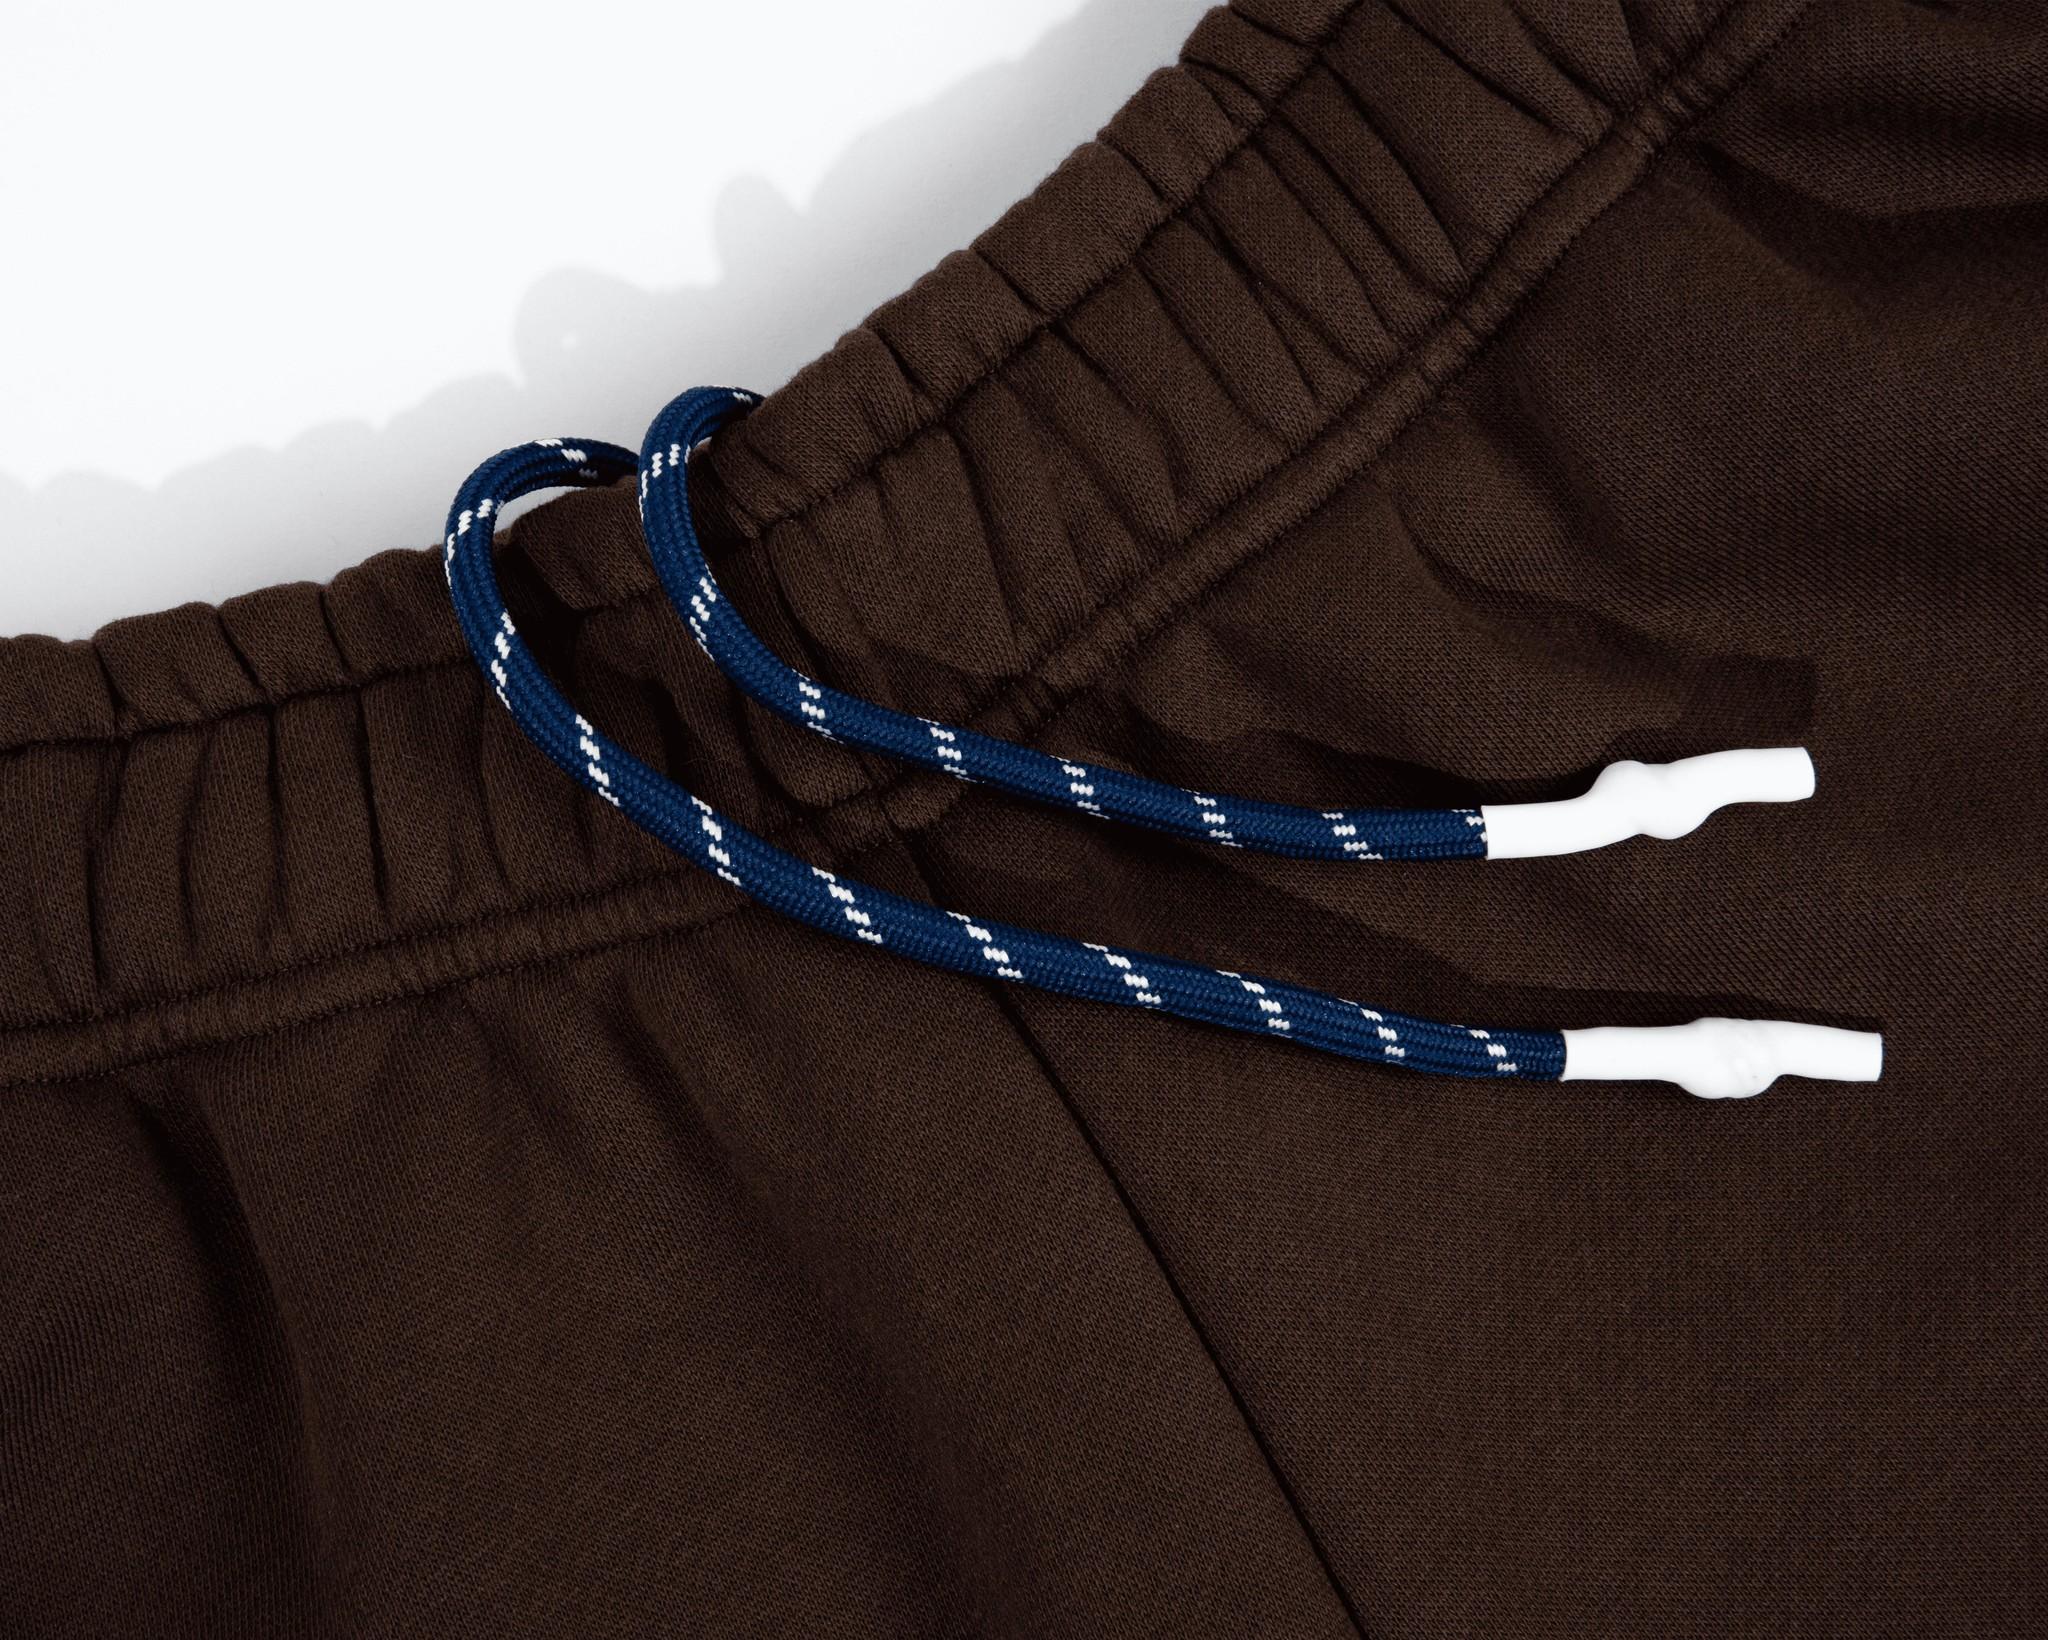 PAL Jock sweatpants deep brown